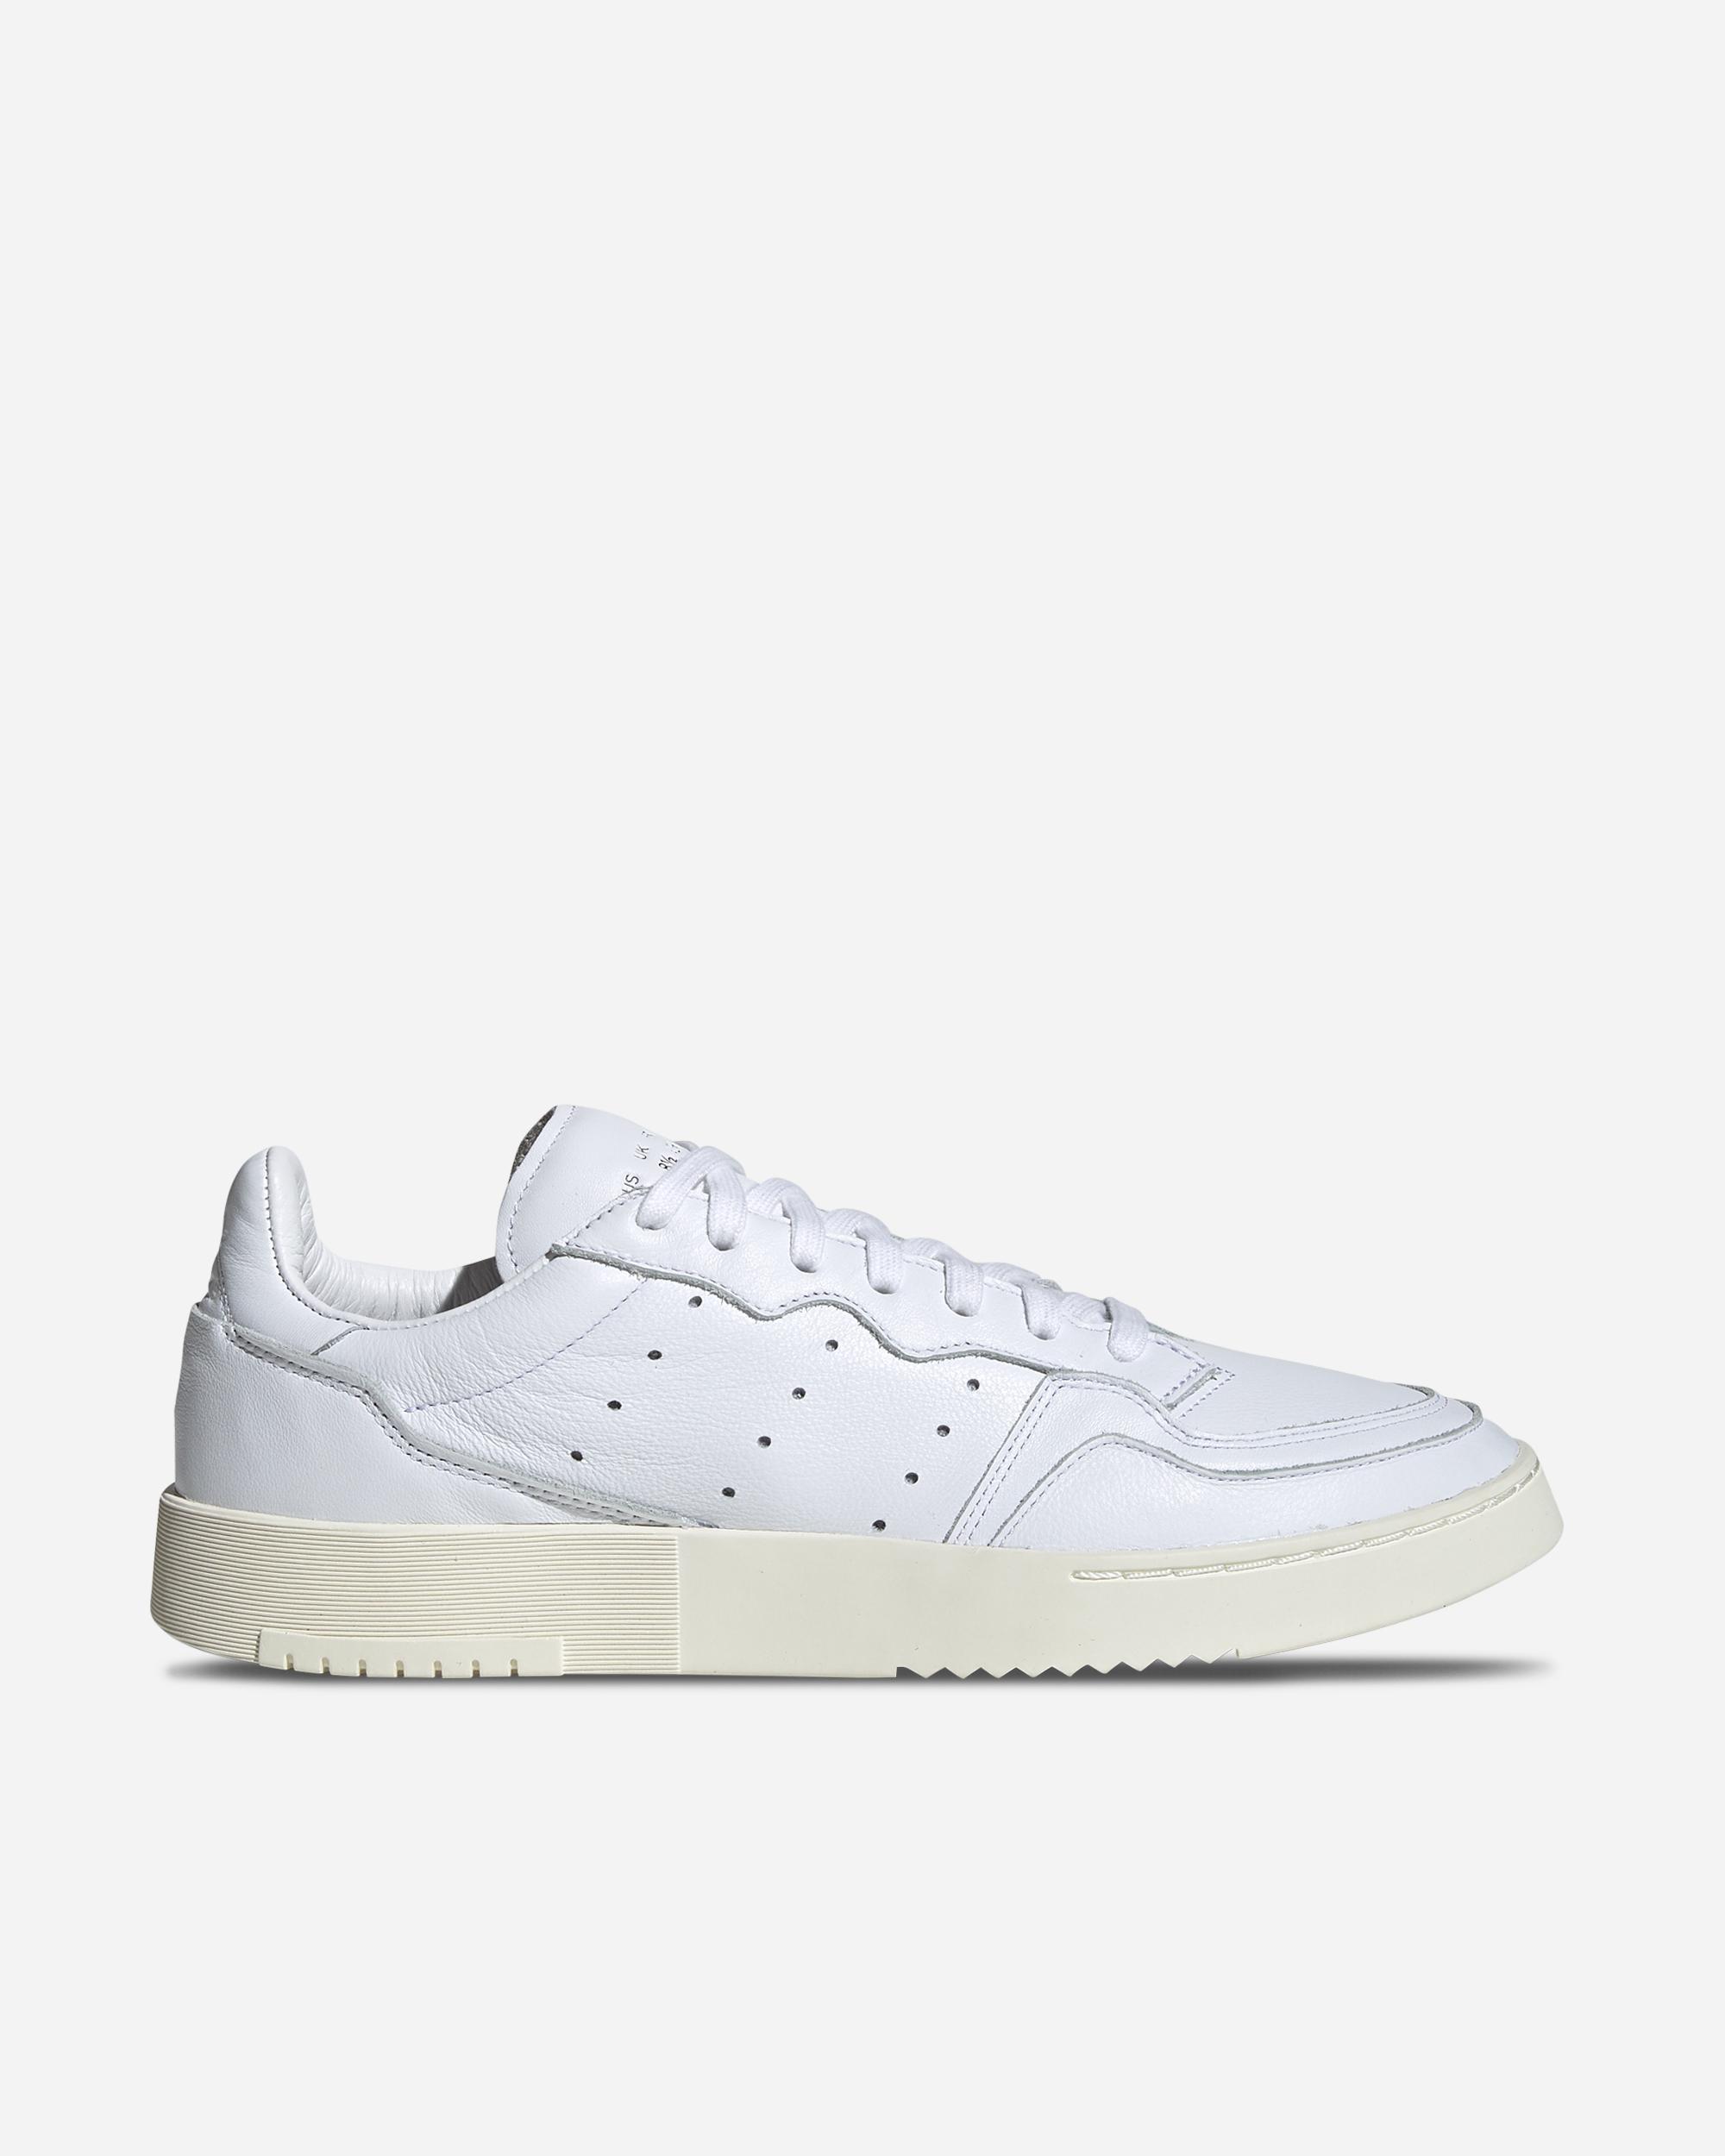 Adidas Originals Supercourt White